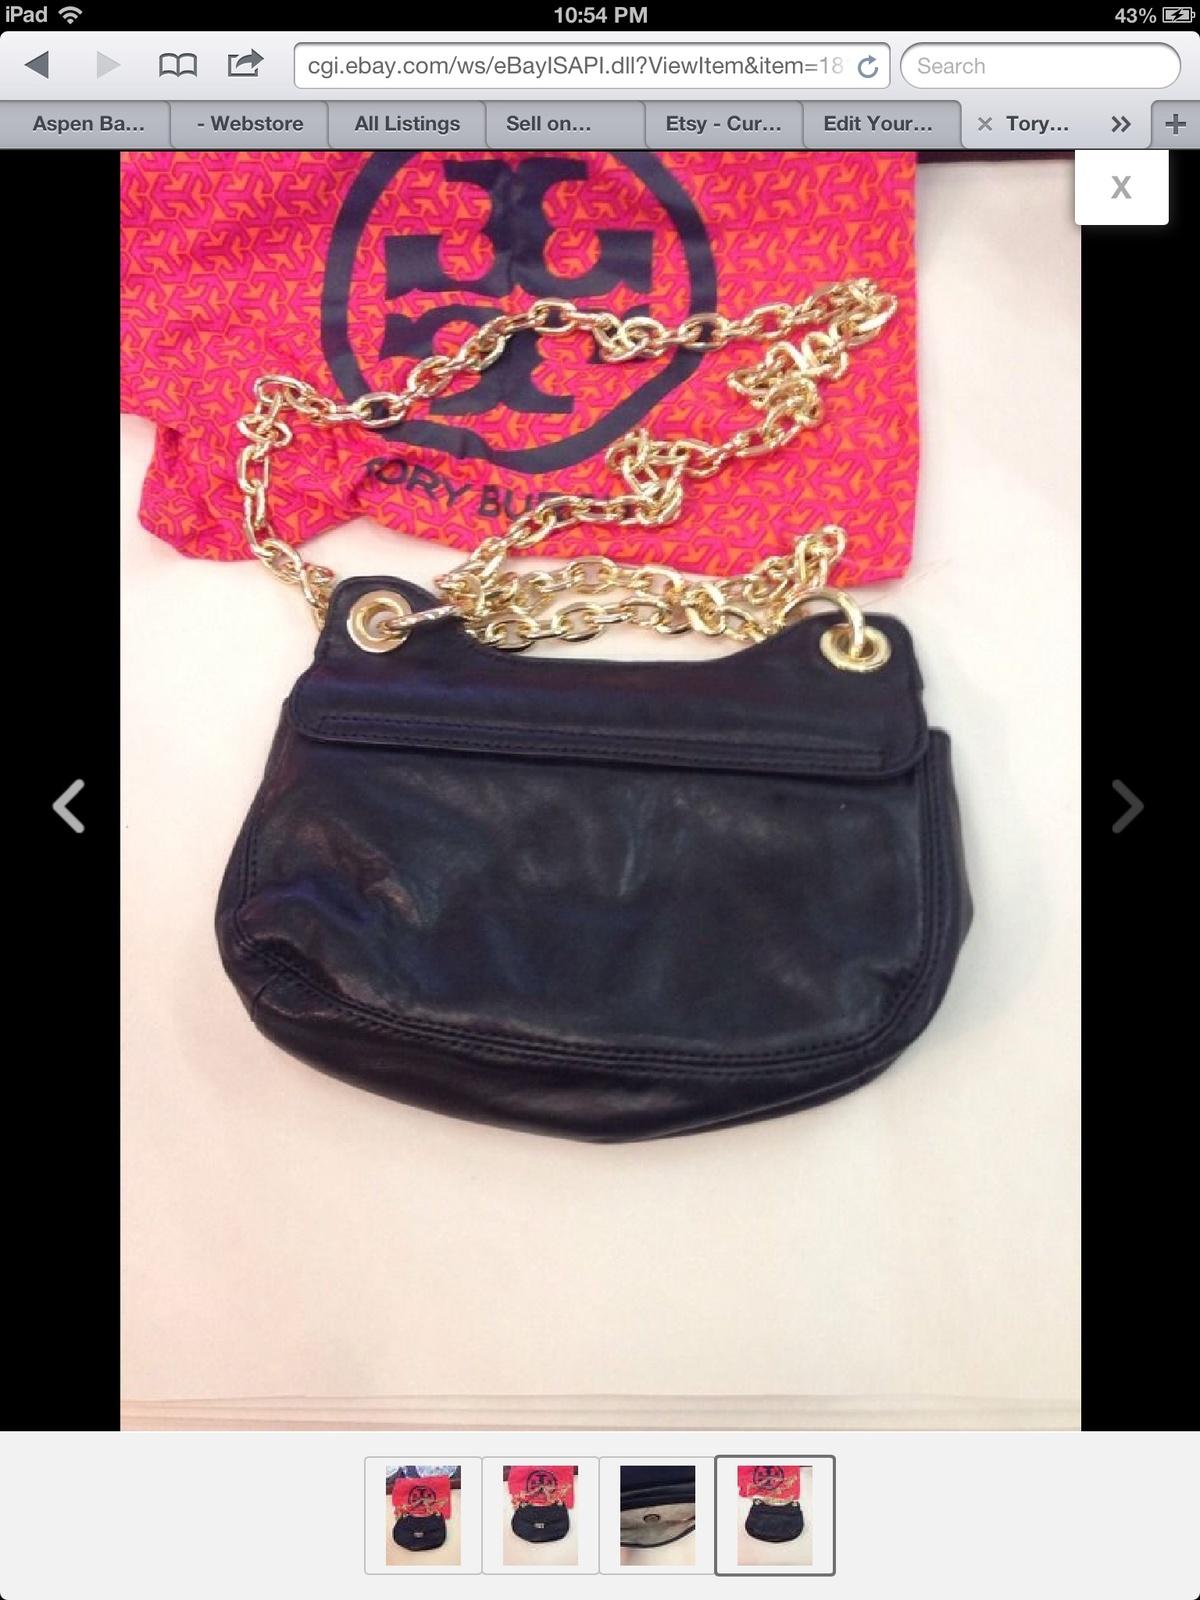 Tory Burch Black Soft Leather Megan Shoulder Bag Handbag Tote Purse W Dust Bag